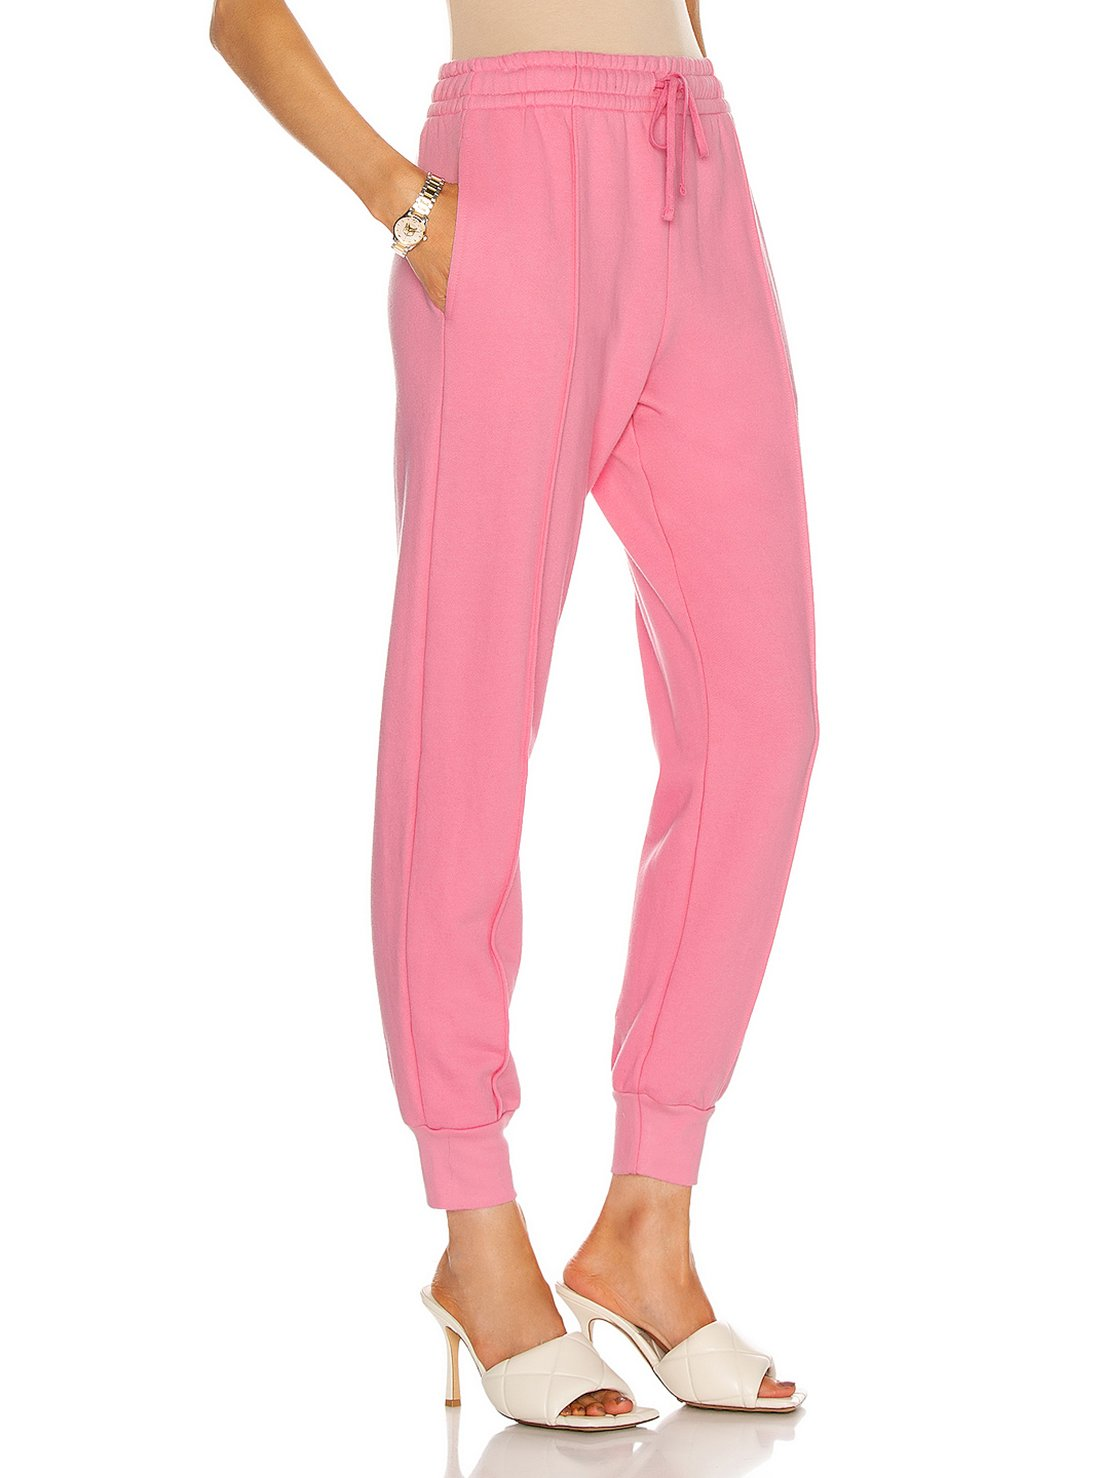 Plus Size Pants for Ladies